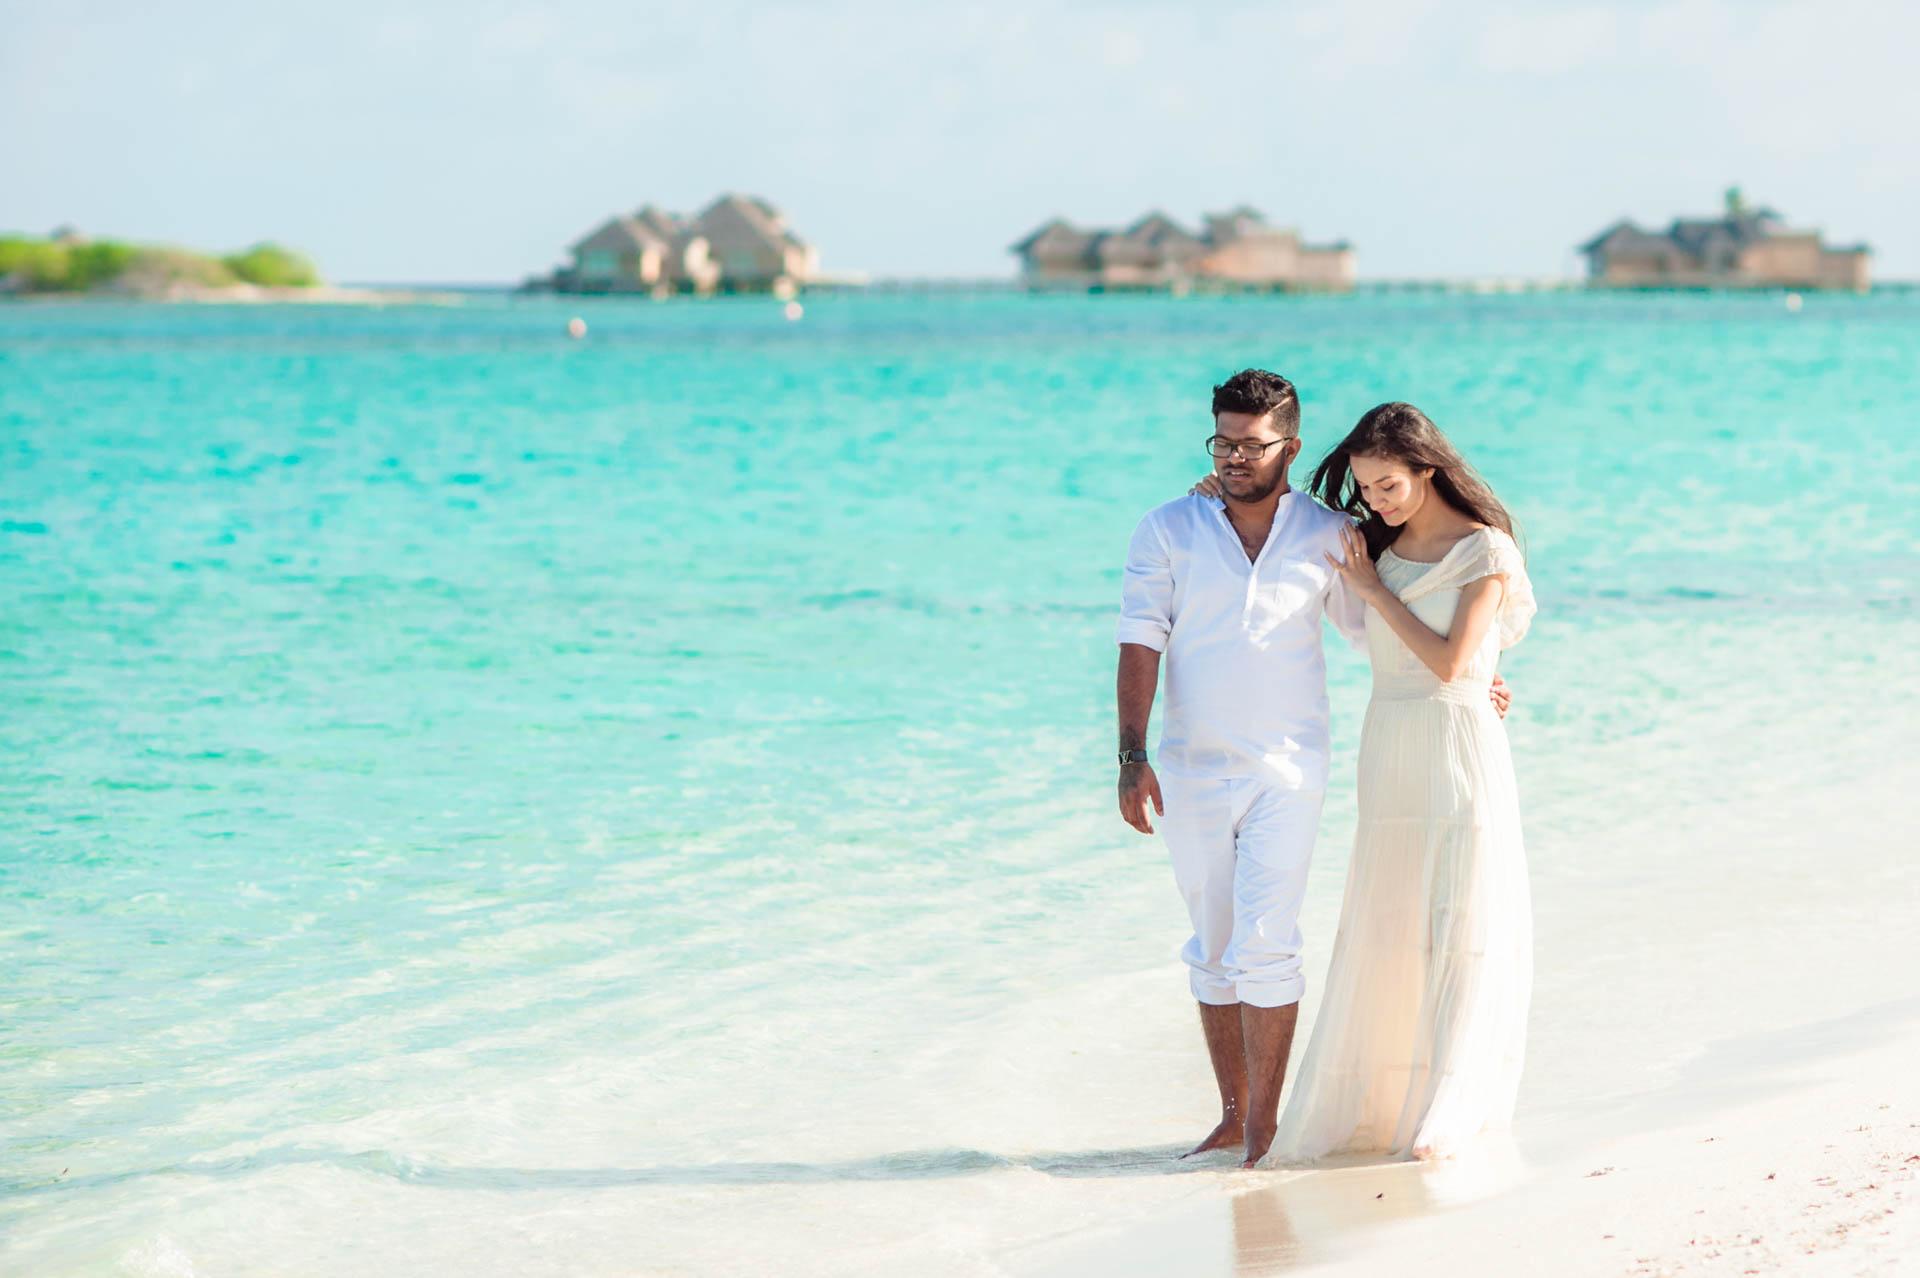 Abhijit Meghna Romantic Vacation in Maldives 4